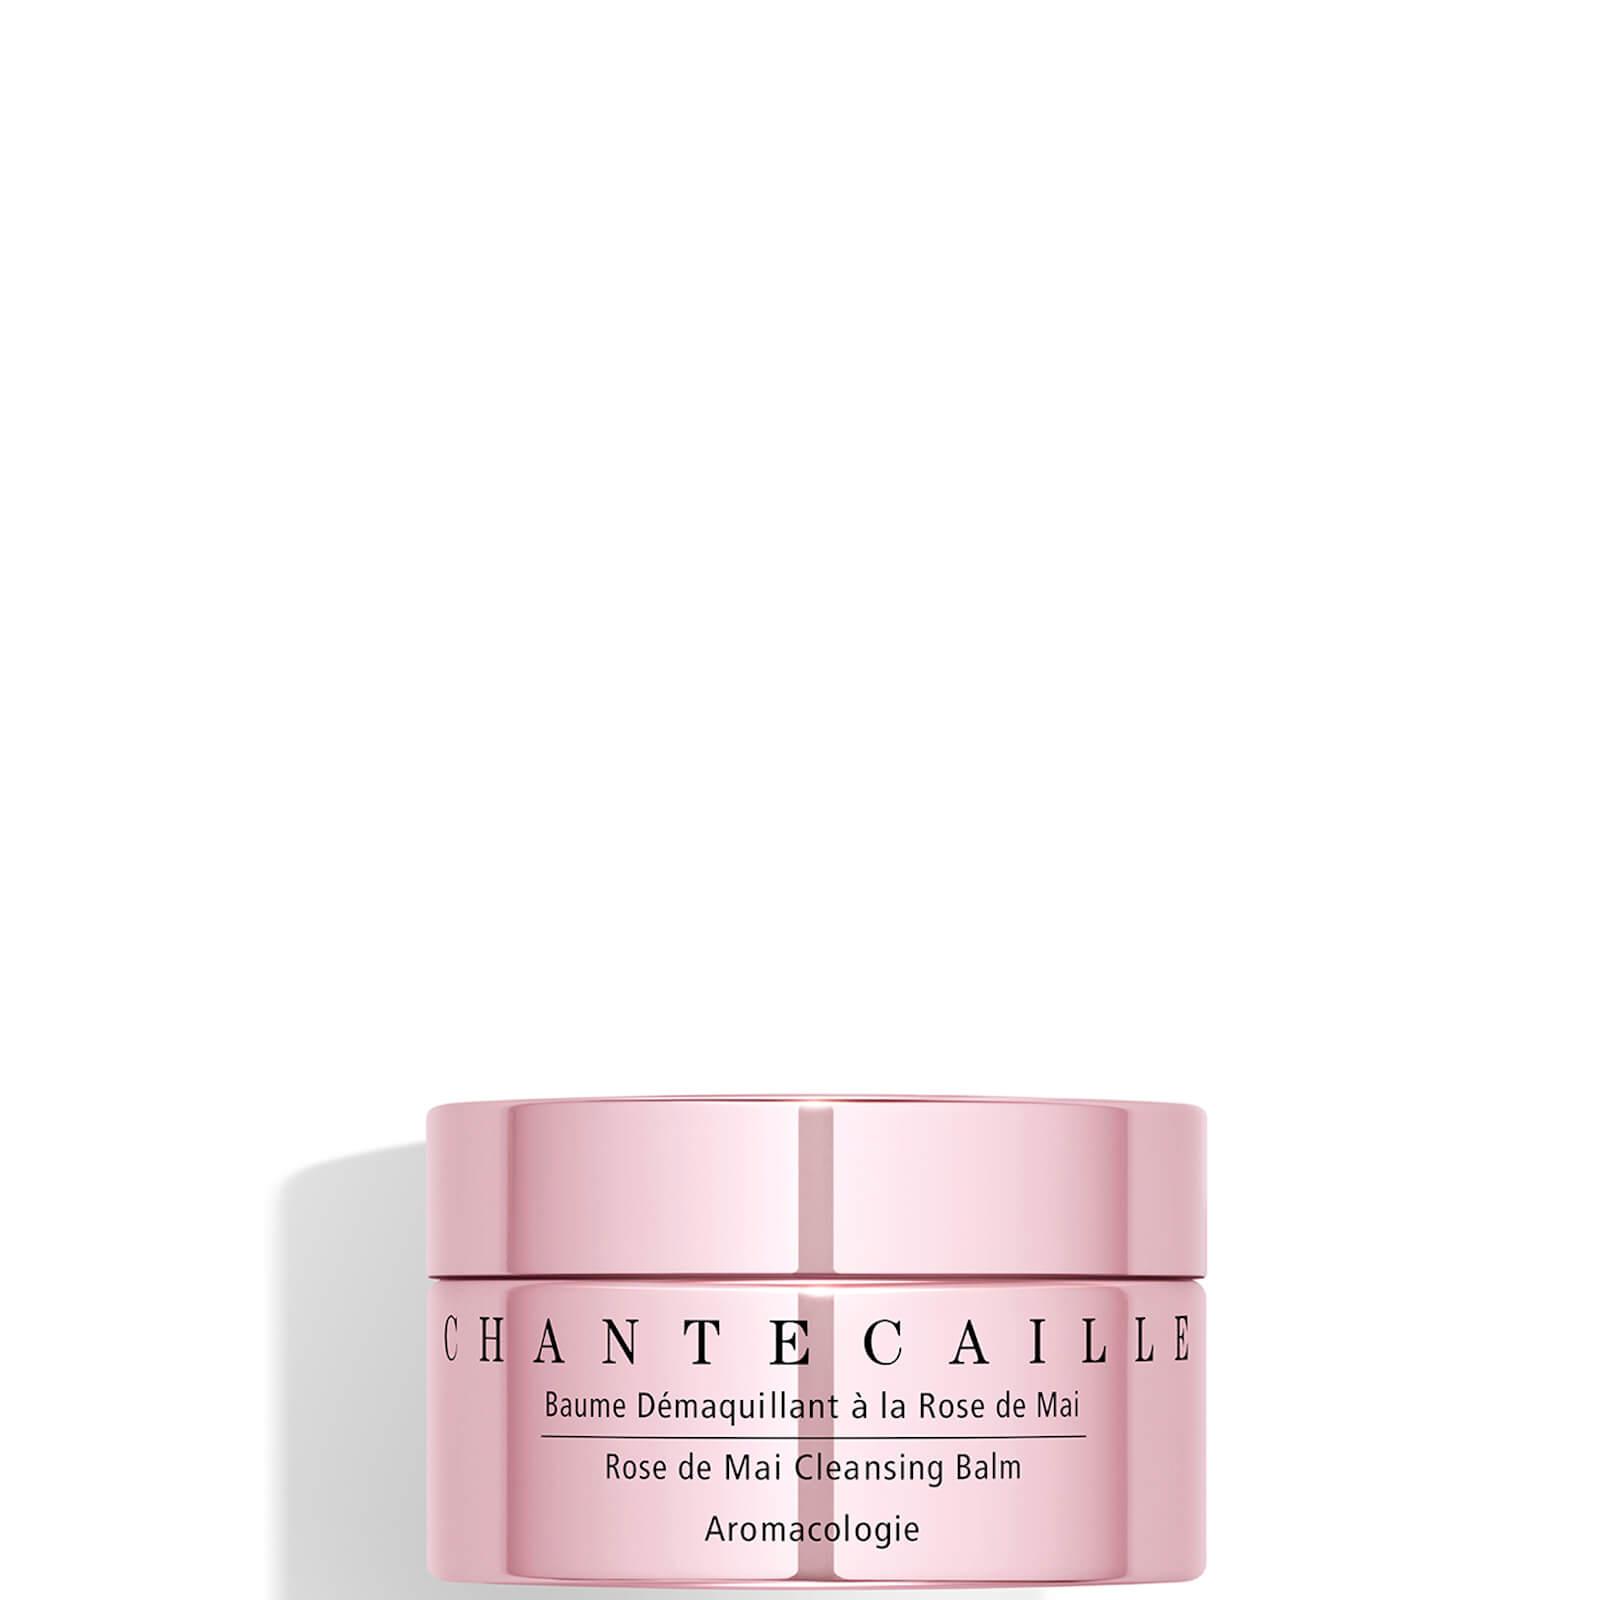 Купить Chantecaille Rose De Mai Cleansing Balm